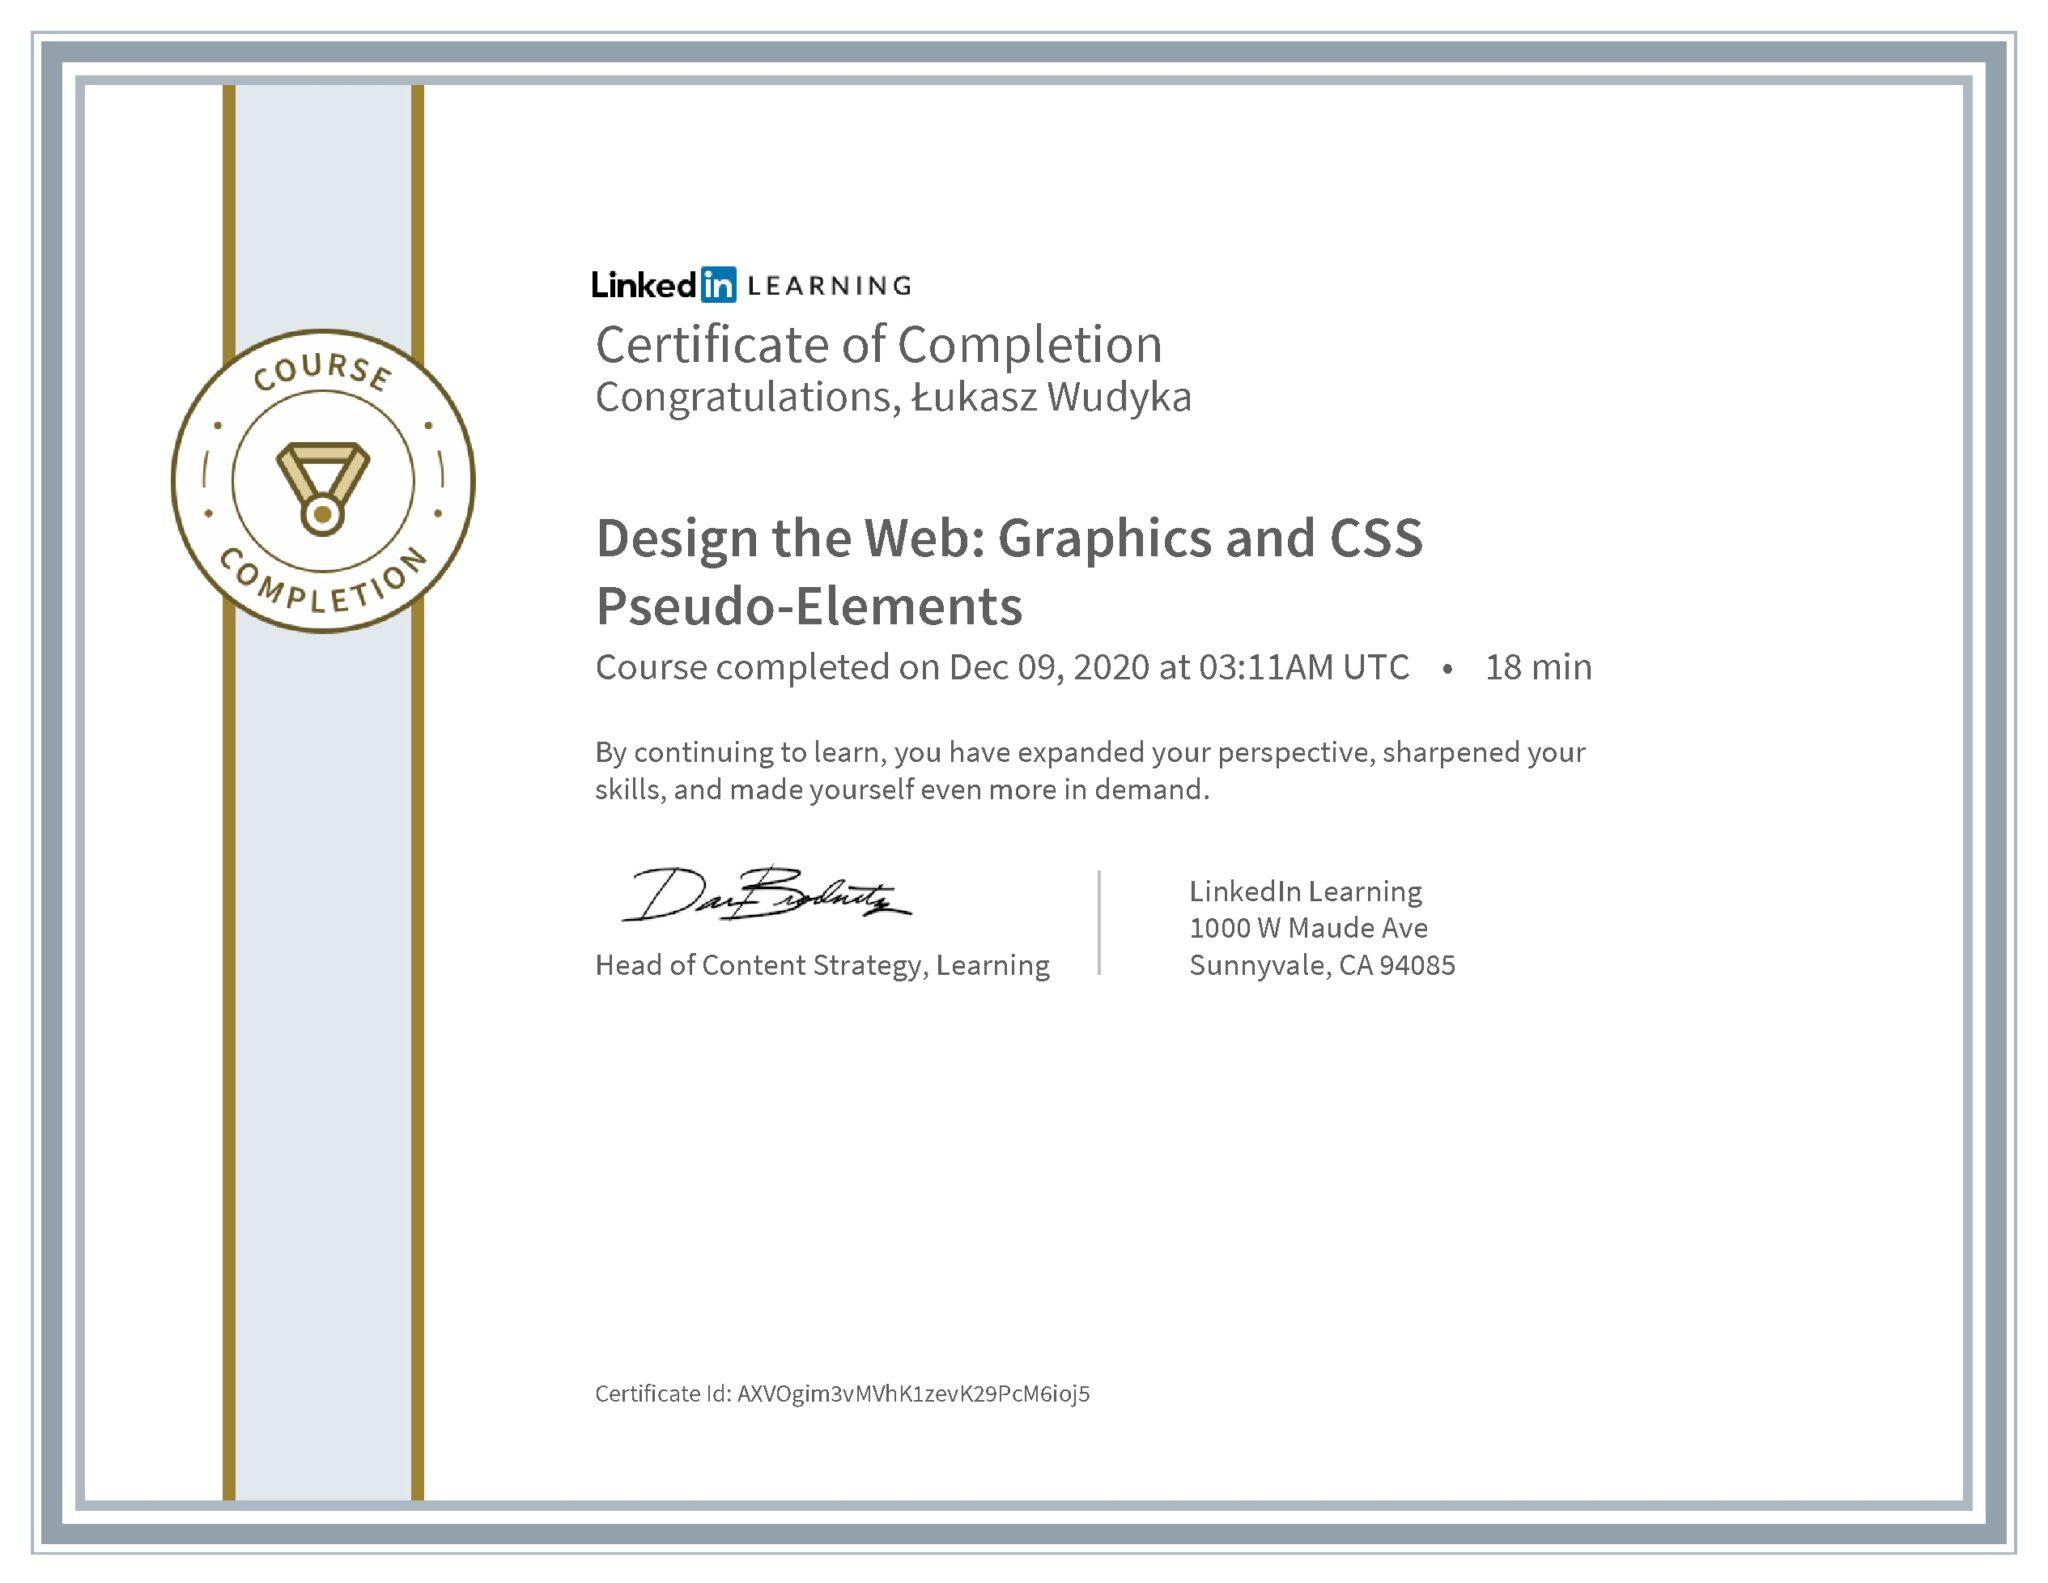 Łukasz Wudyka certyfikat LinkedIn Design the Web: Graphics and CSS Pseudo-Elements